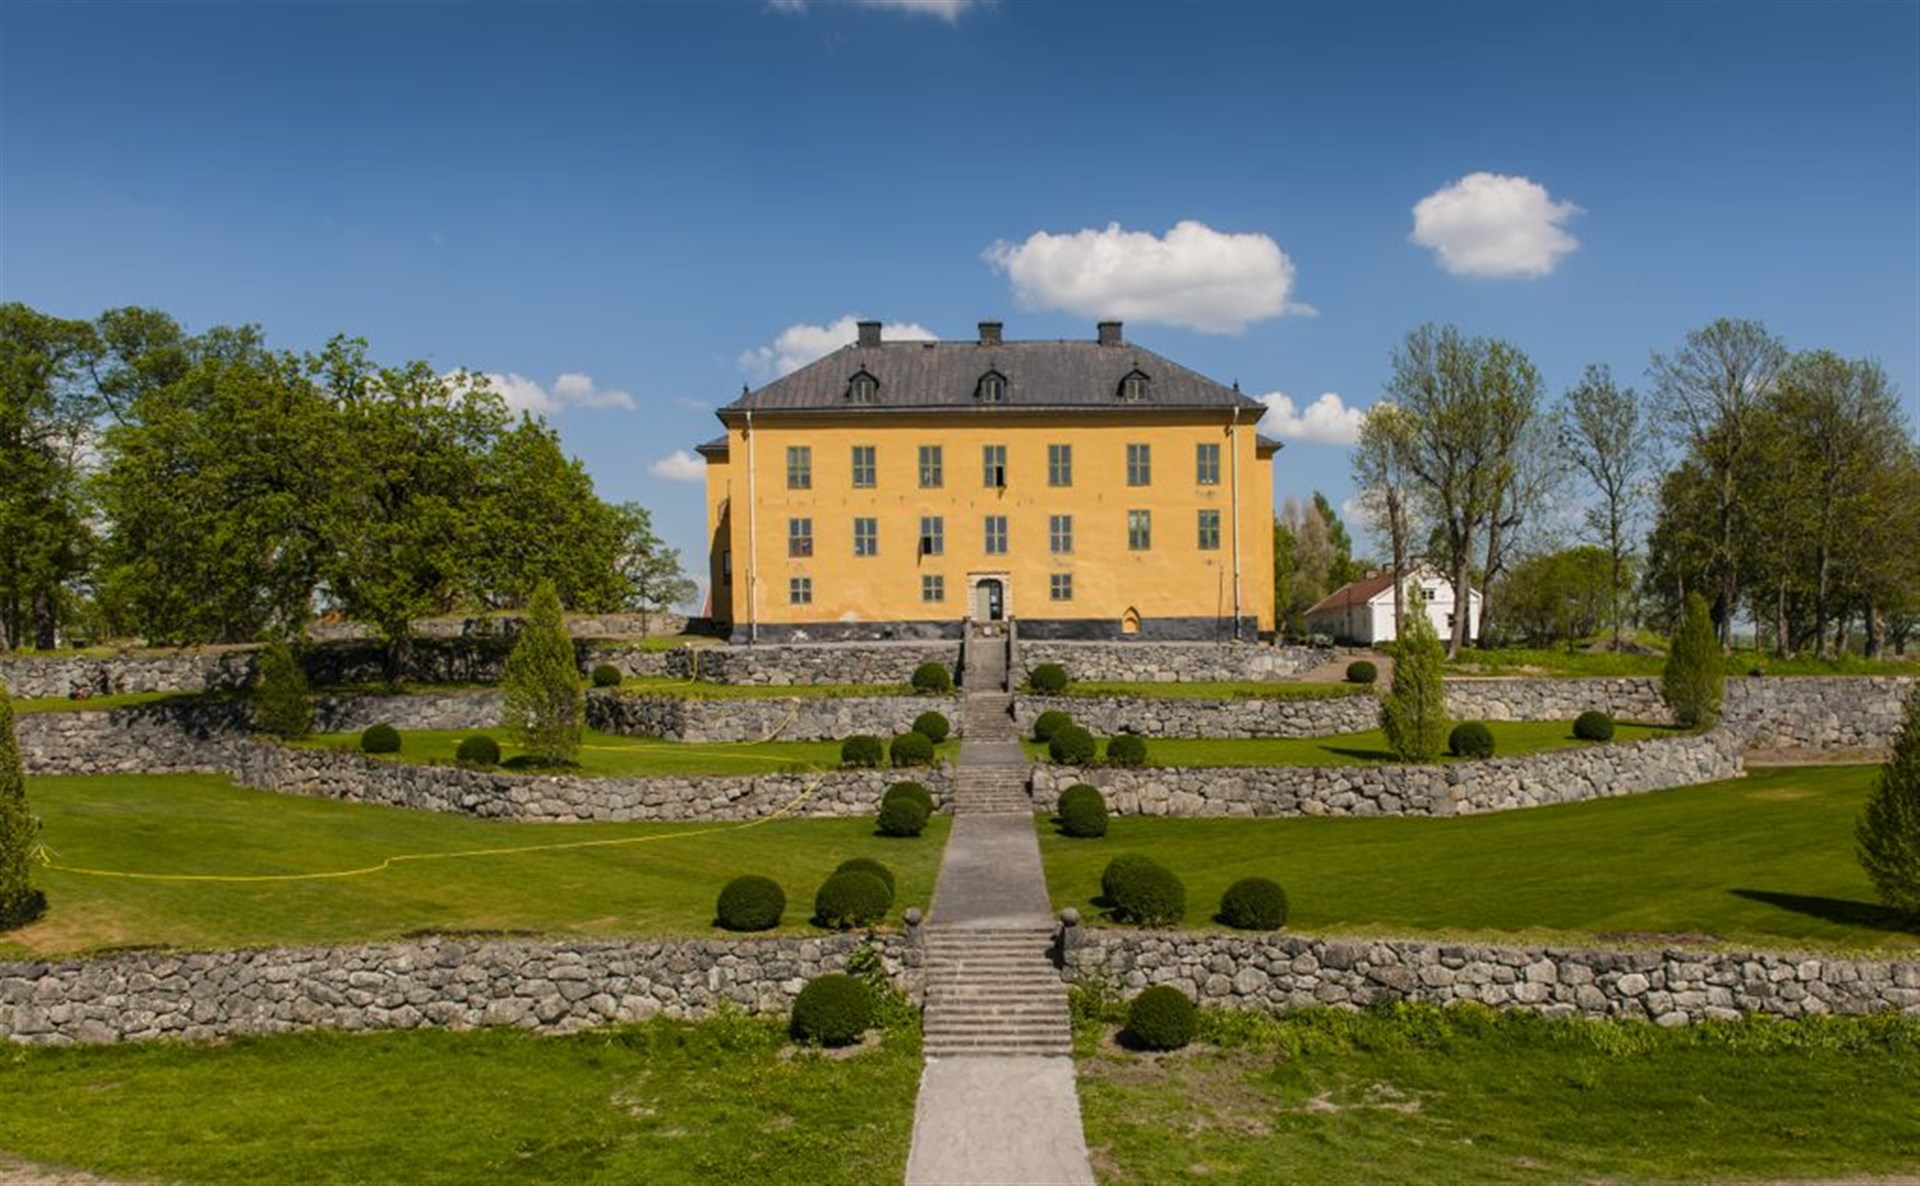 Wenngarns slott